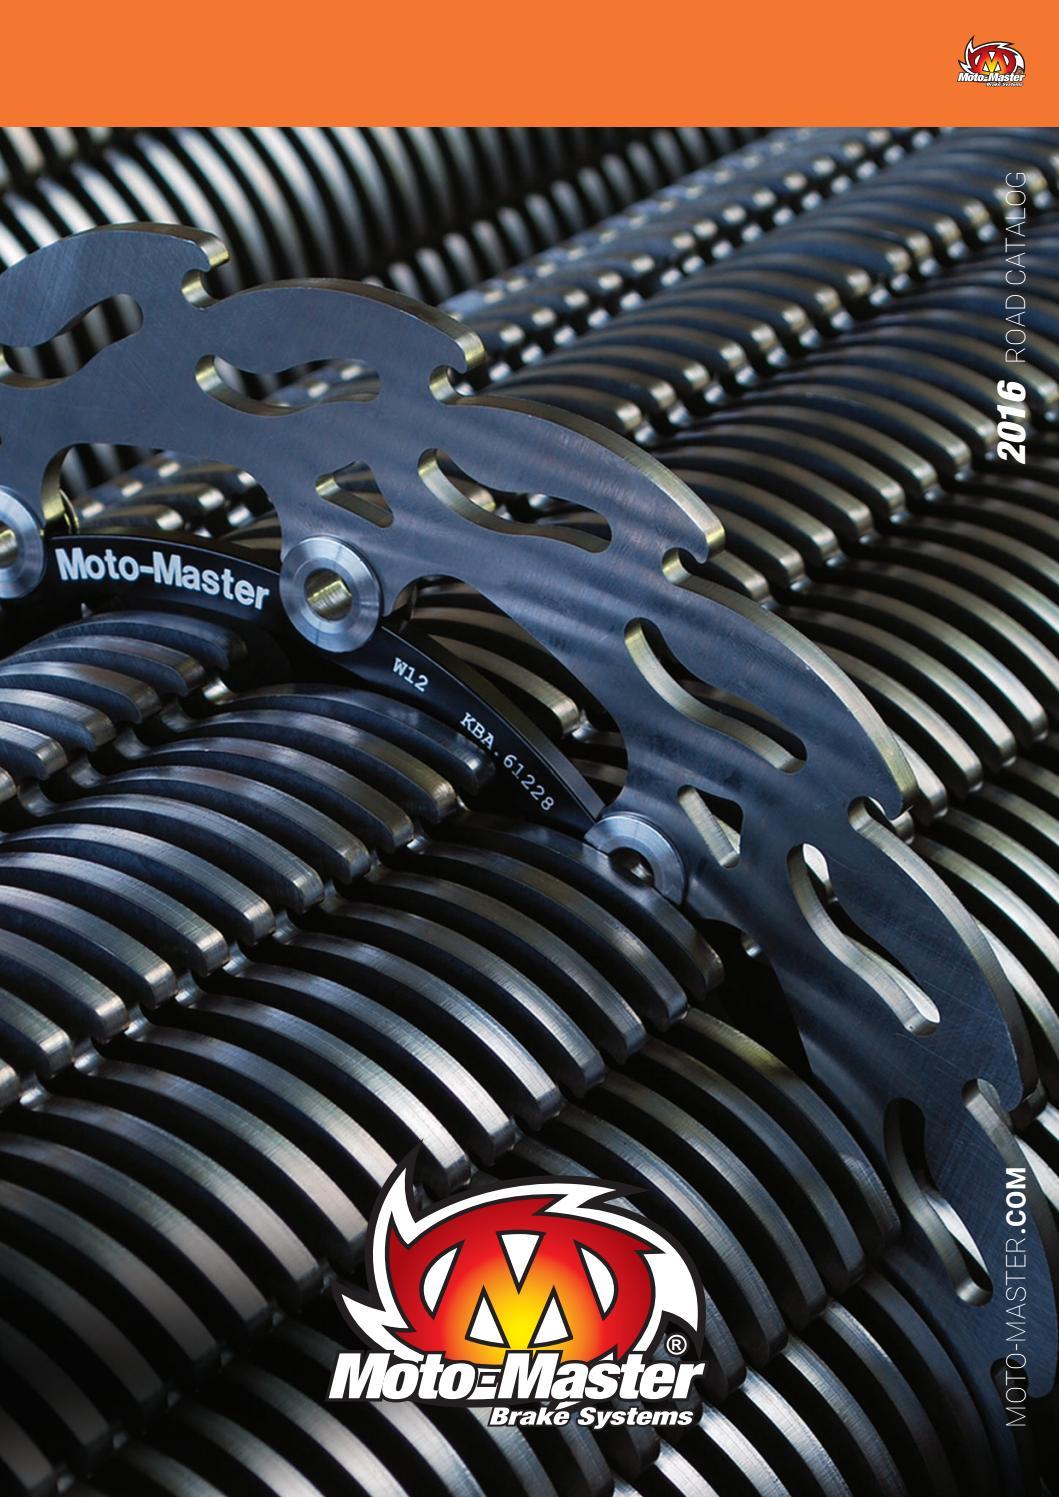 FRONT REAR Brake Pads CAGIVA Mito 125 All models 1993-2003 2004 2005 2006 2007